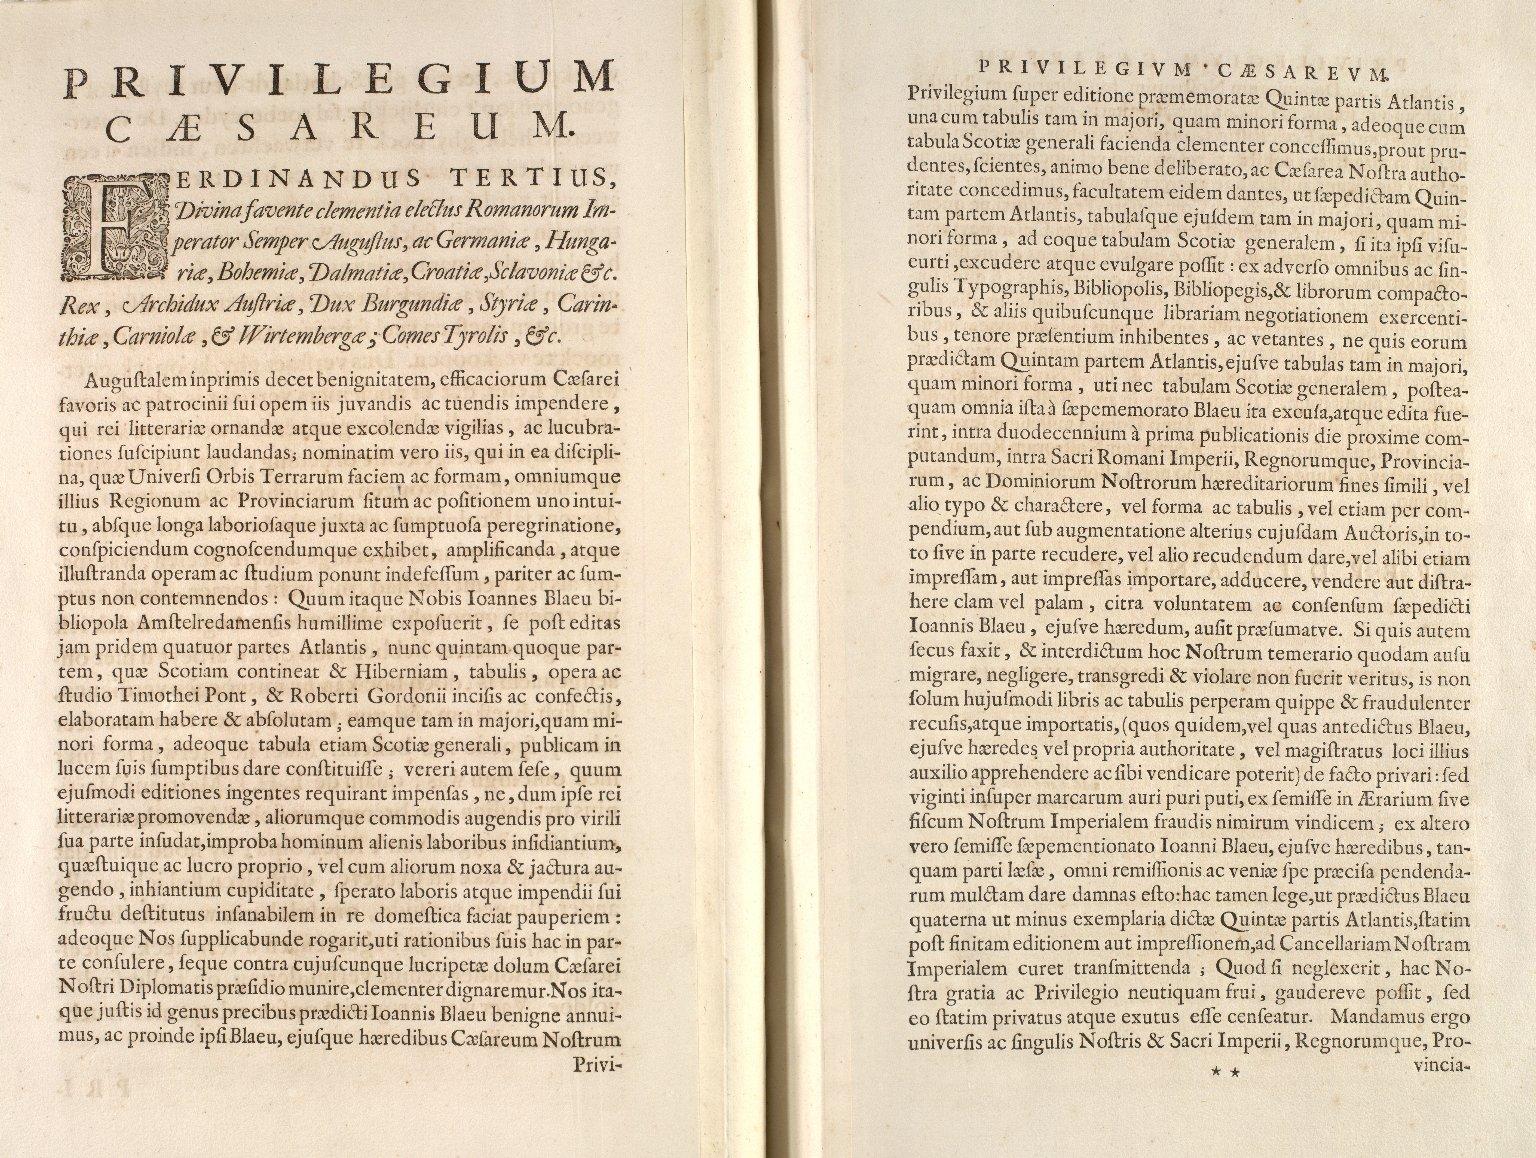 [Geographiae Blavianae] [Also known as: Atlas major] [006 of 153]